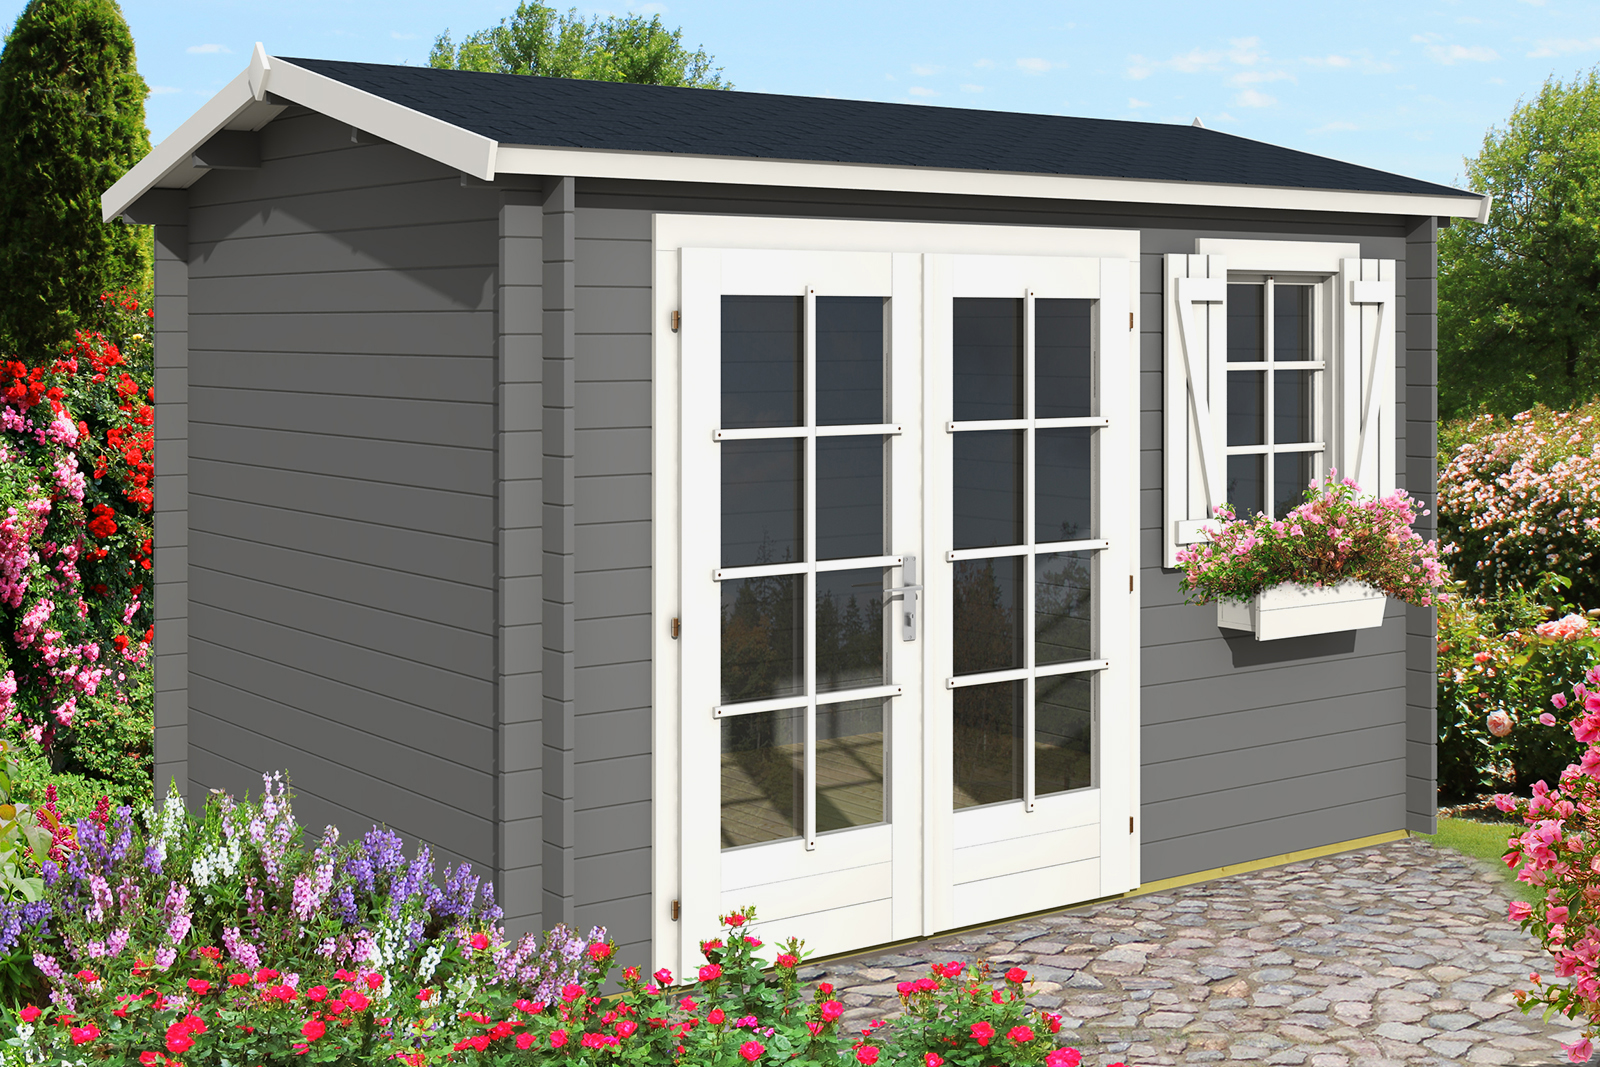 gartenhaus luisa 28 gartenhaus luisa 28. Black Bedroom Furniture Sets. Home Design Ideas